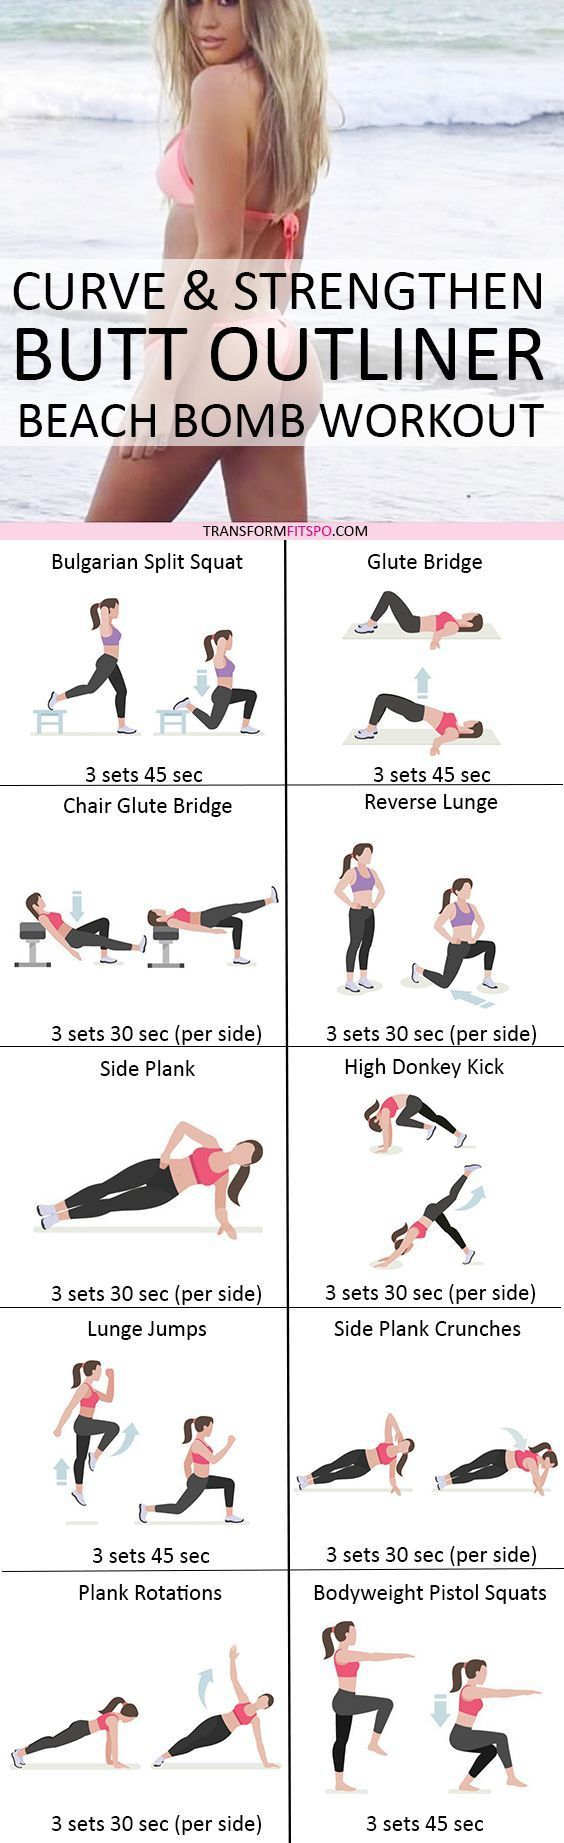 Best 25+ Bum Workout Ideas On Pinterest | Butt Workouts, Glutes And Thighs